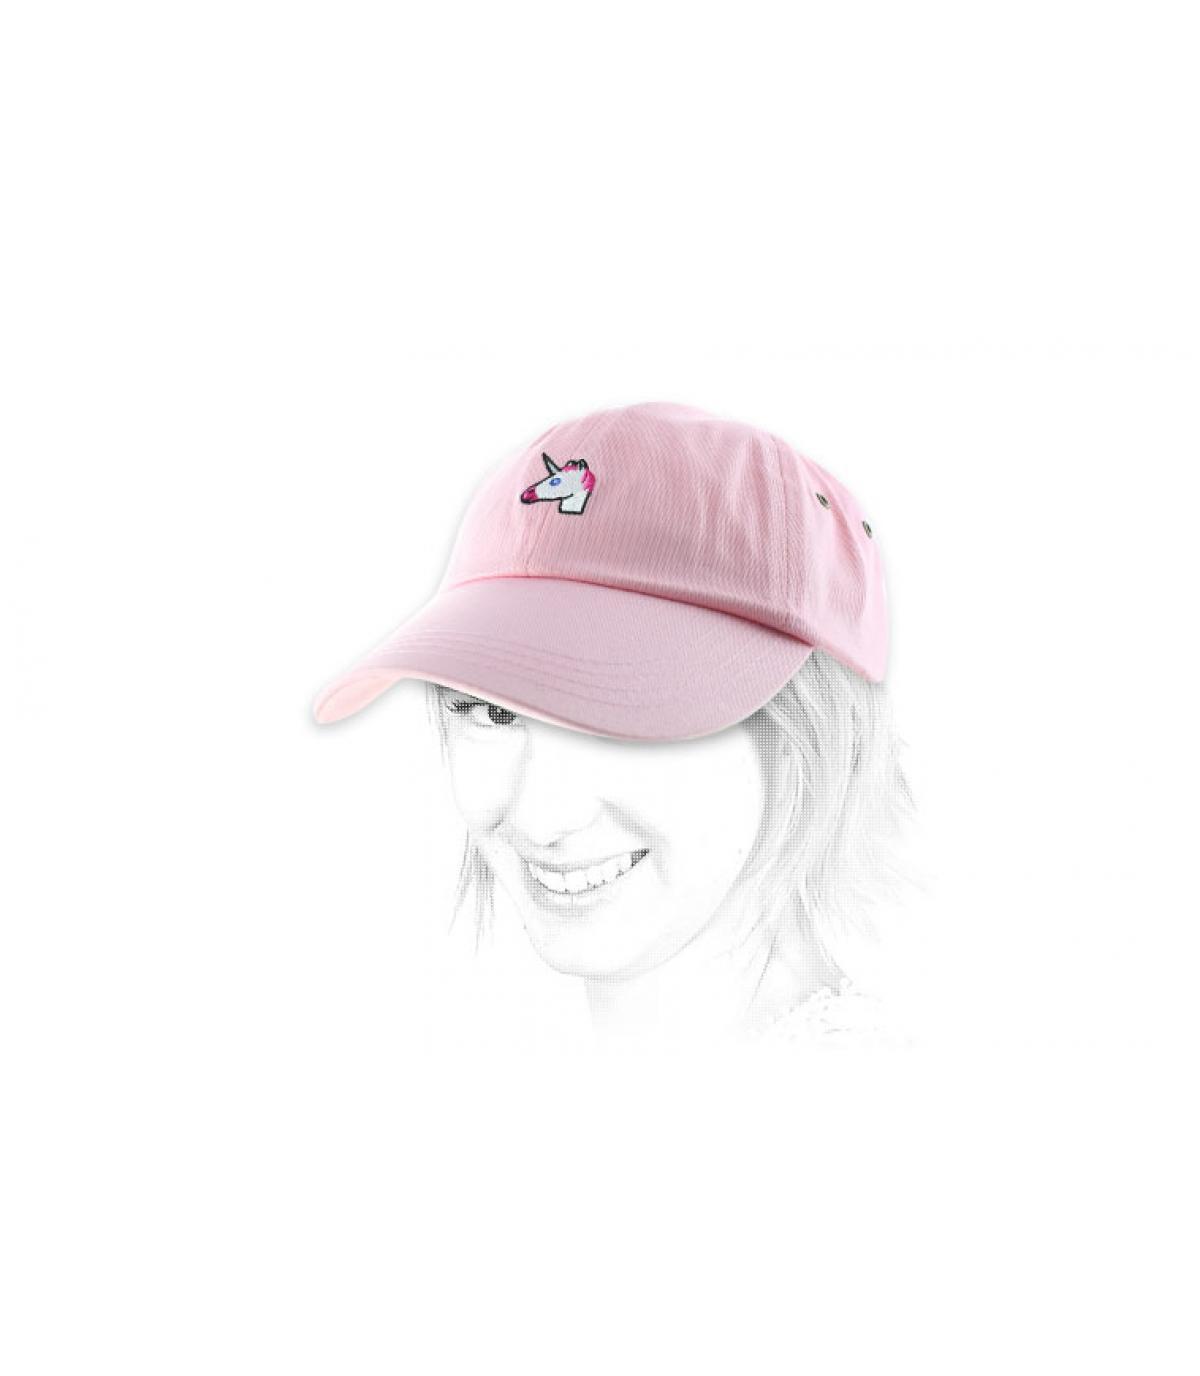 Pink unicorn cap